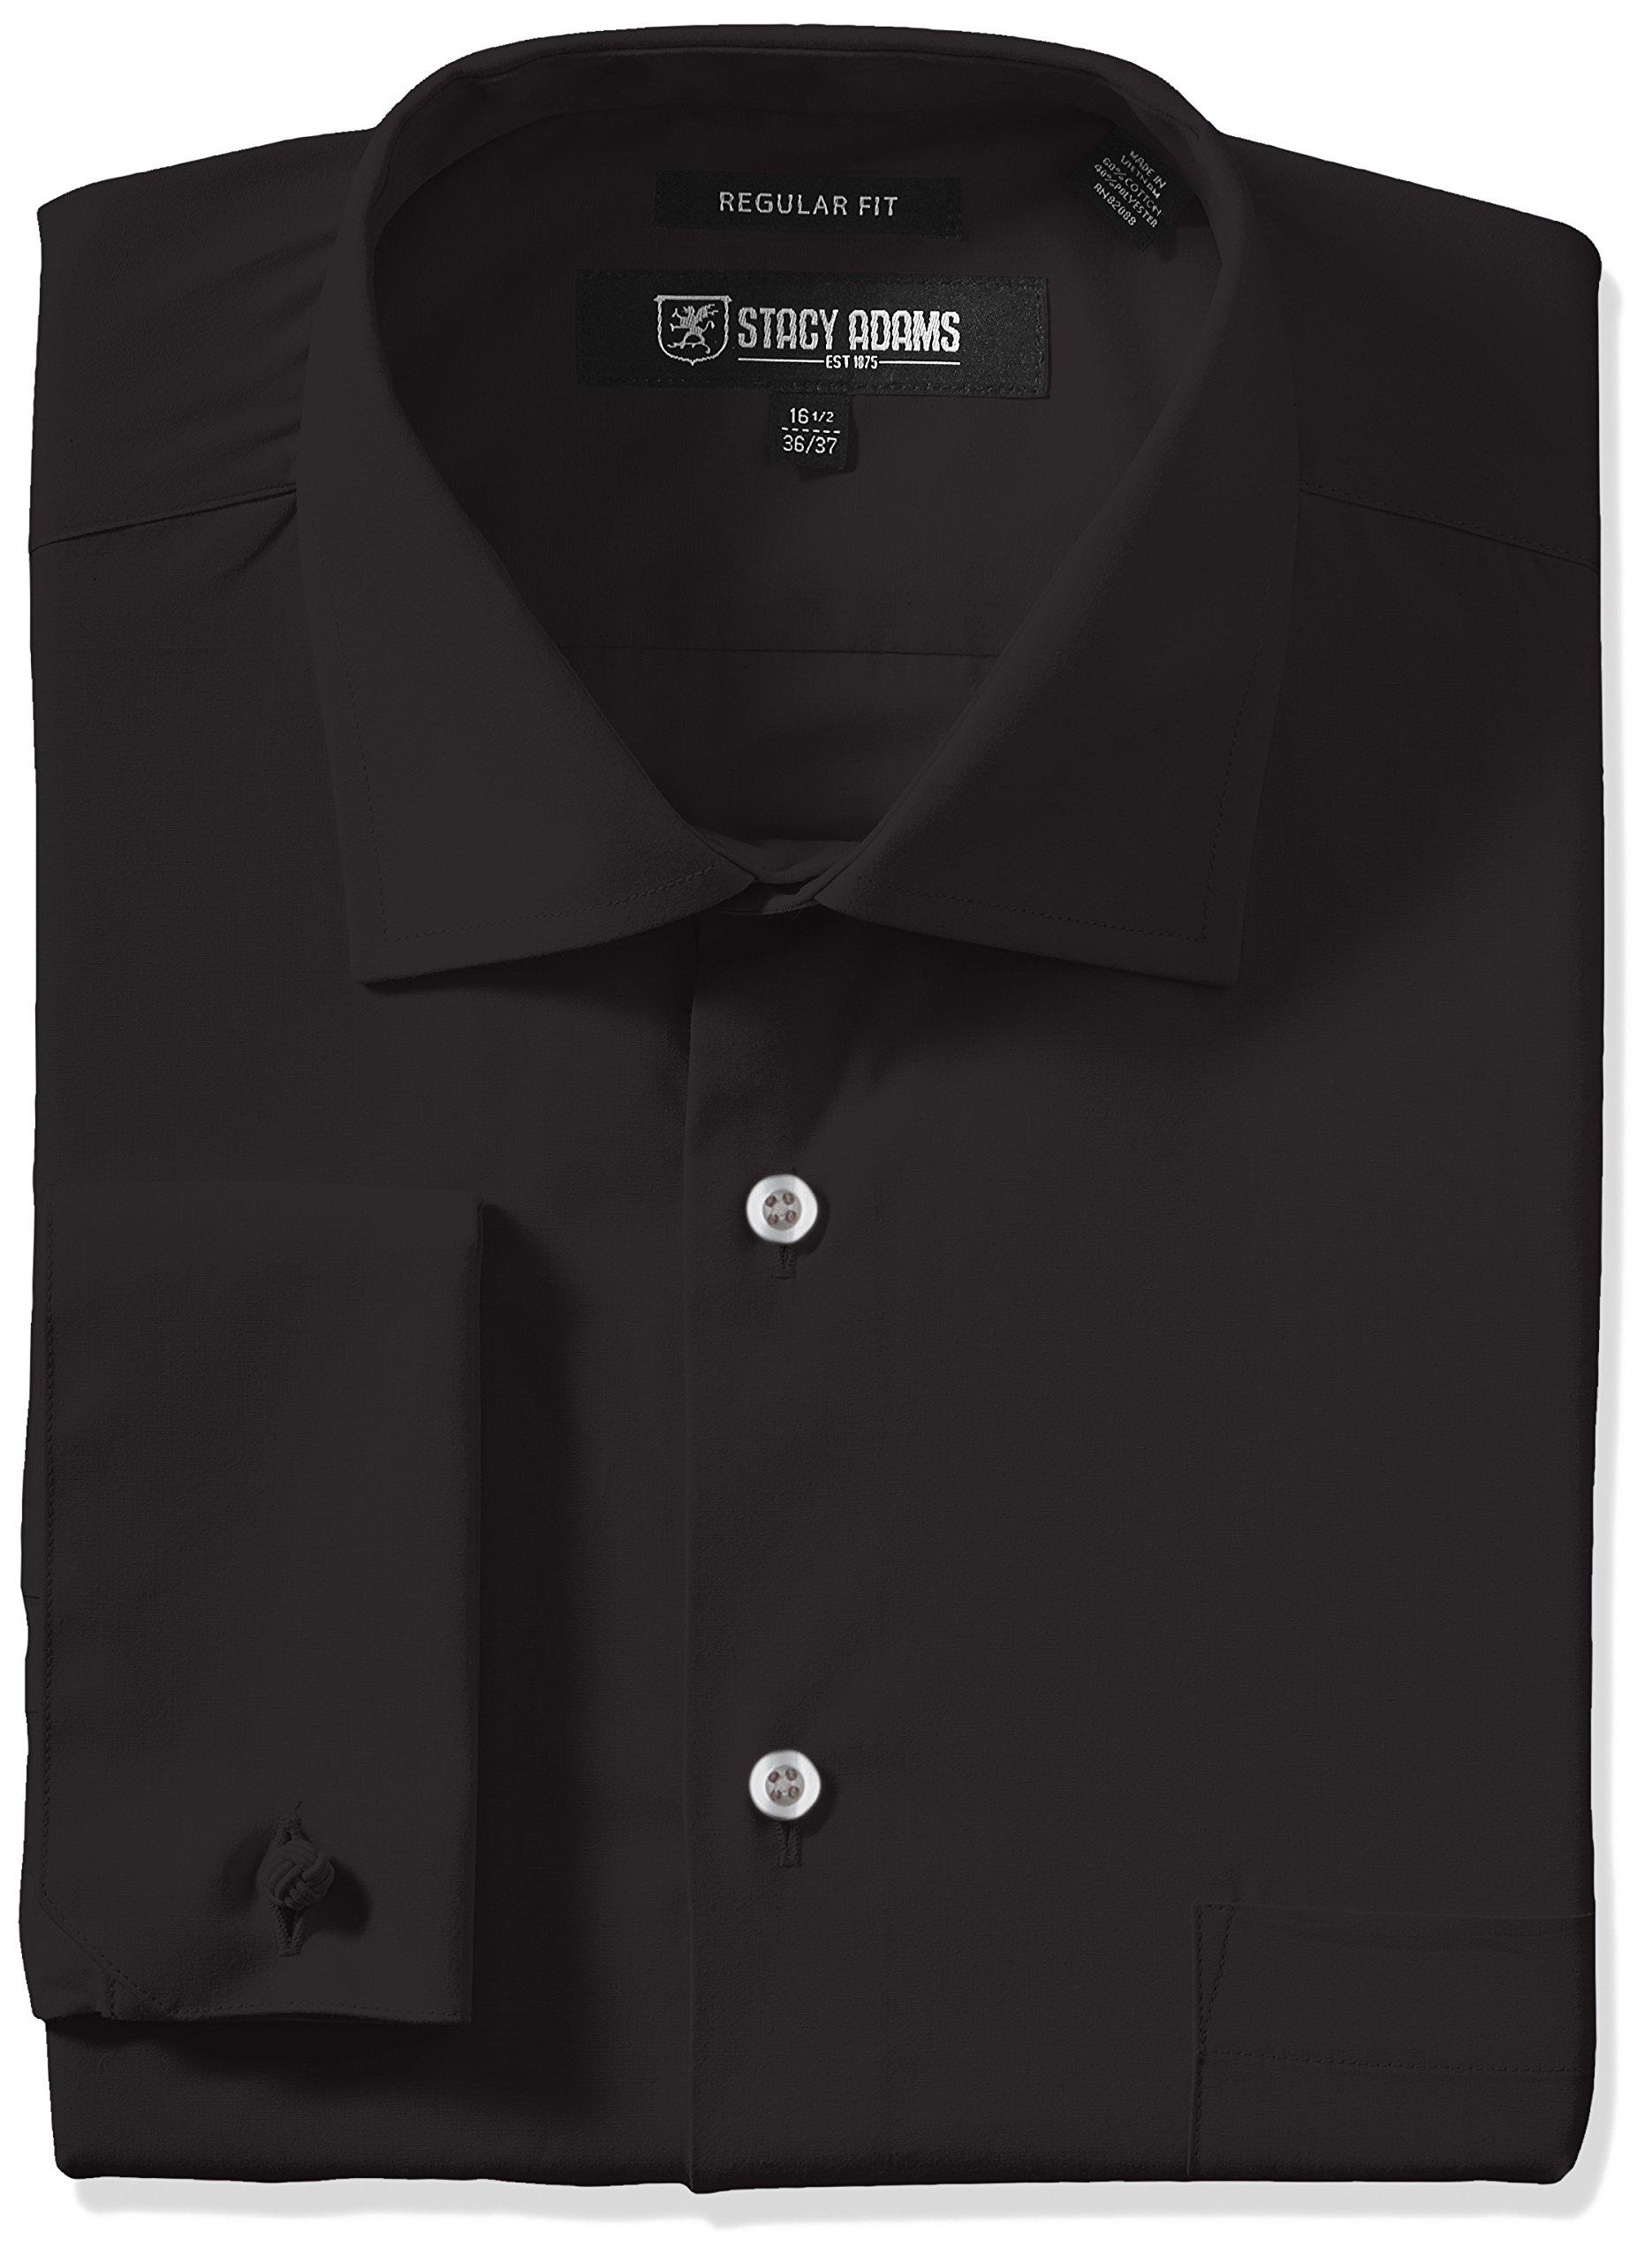 Stacy Adams Men's Big and Tall Adjustable Collar Dress Shirt, Black, 20'' Neck 34''-35'' Sleeve